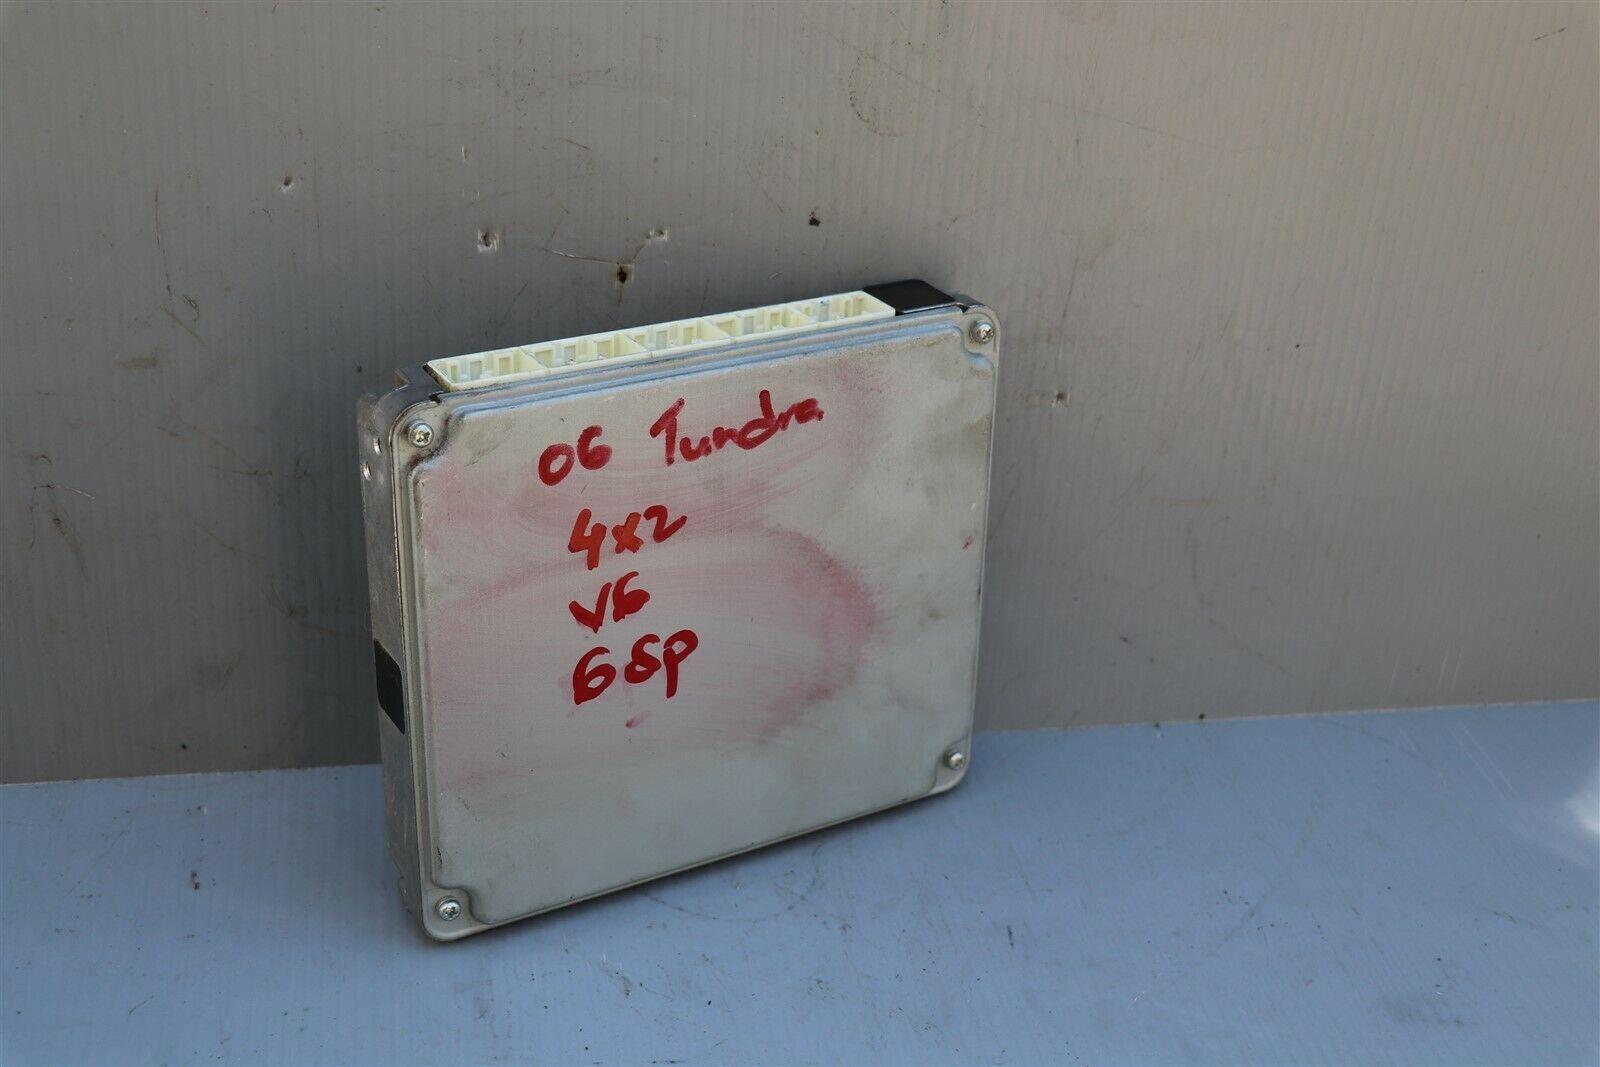 06 Tundra 4.0L 4x2 6sp Manual MTX ECM ECU Engine Control Module 89661-0C710